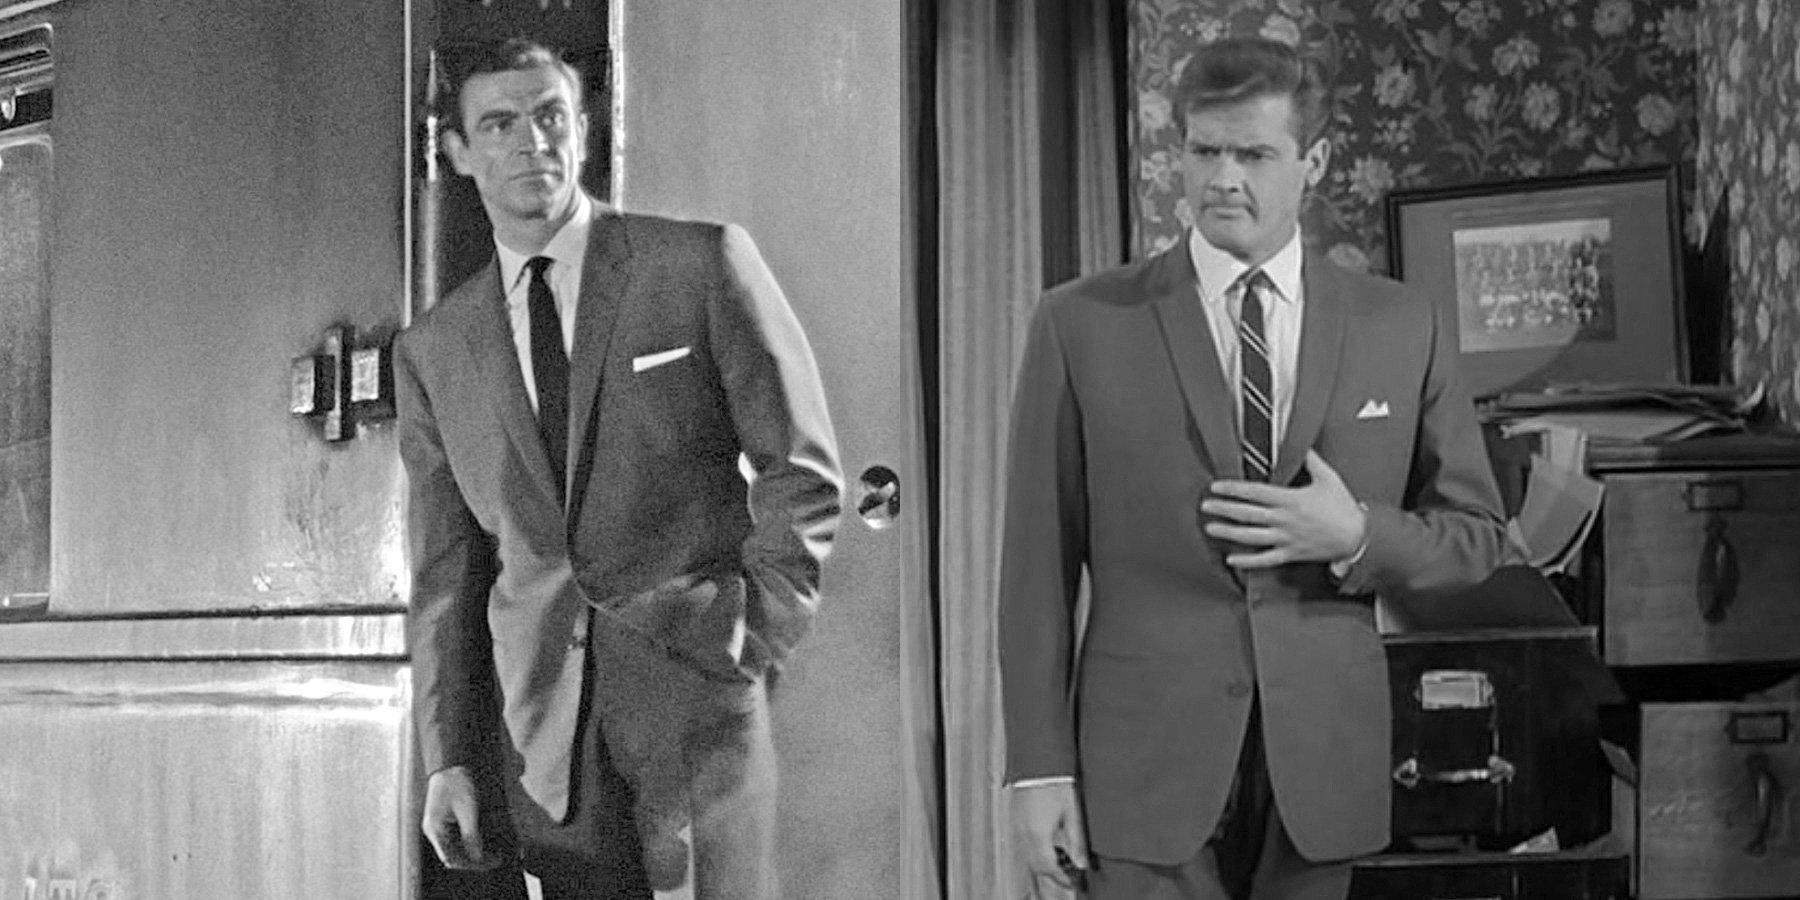 The Saint Hommes Britannique TV Drama Capuche Roger Moore Spy James Bond 007